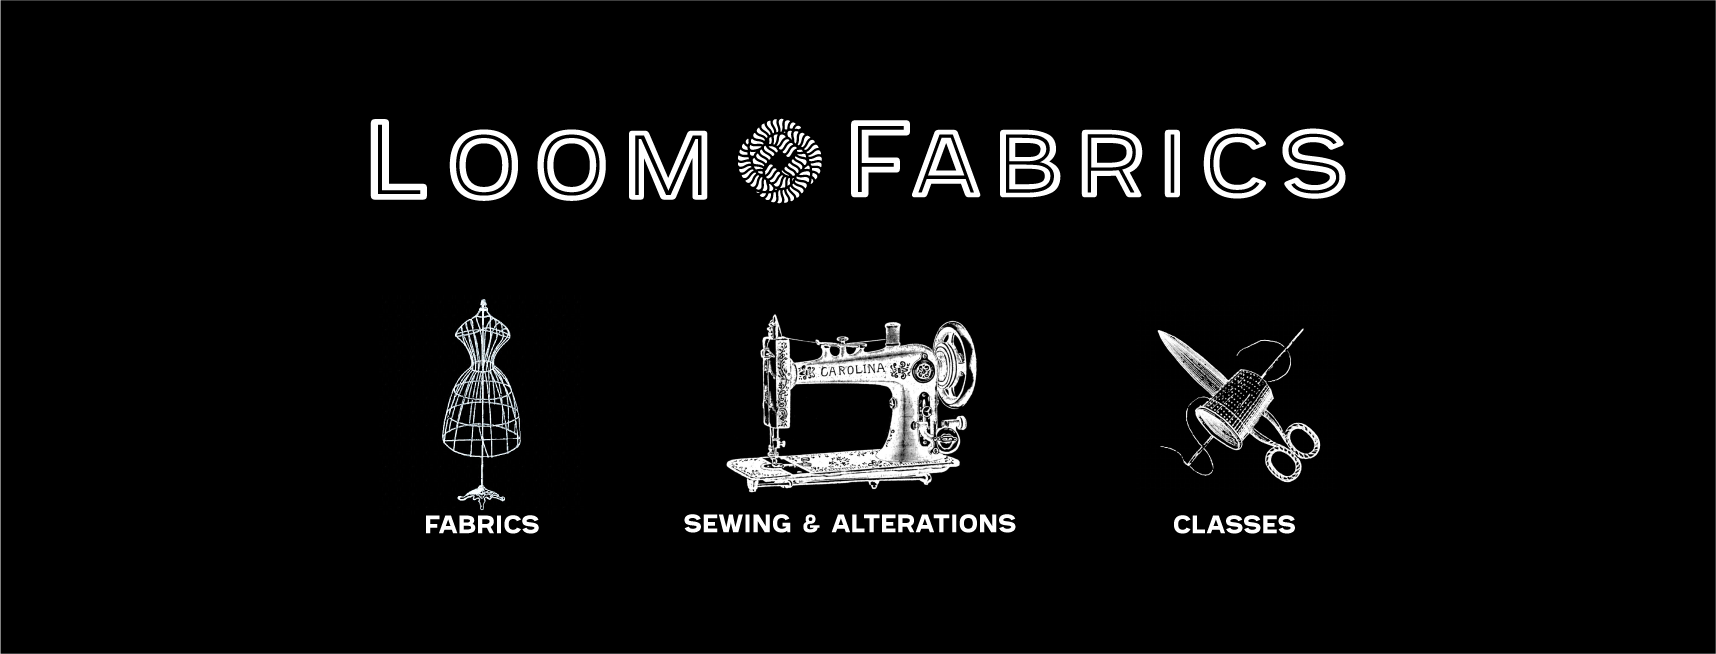 Loom fabrics Bowral - dressmaking fabrics, Sewing, alterations and classes